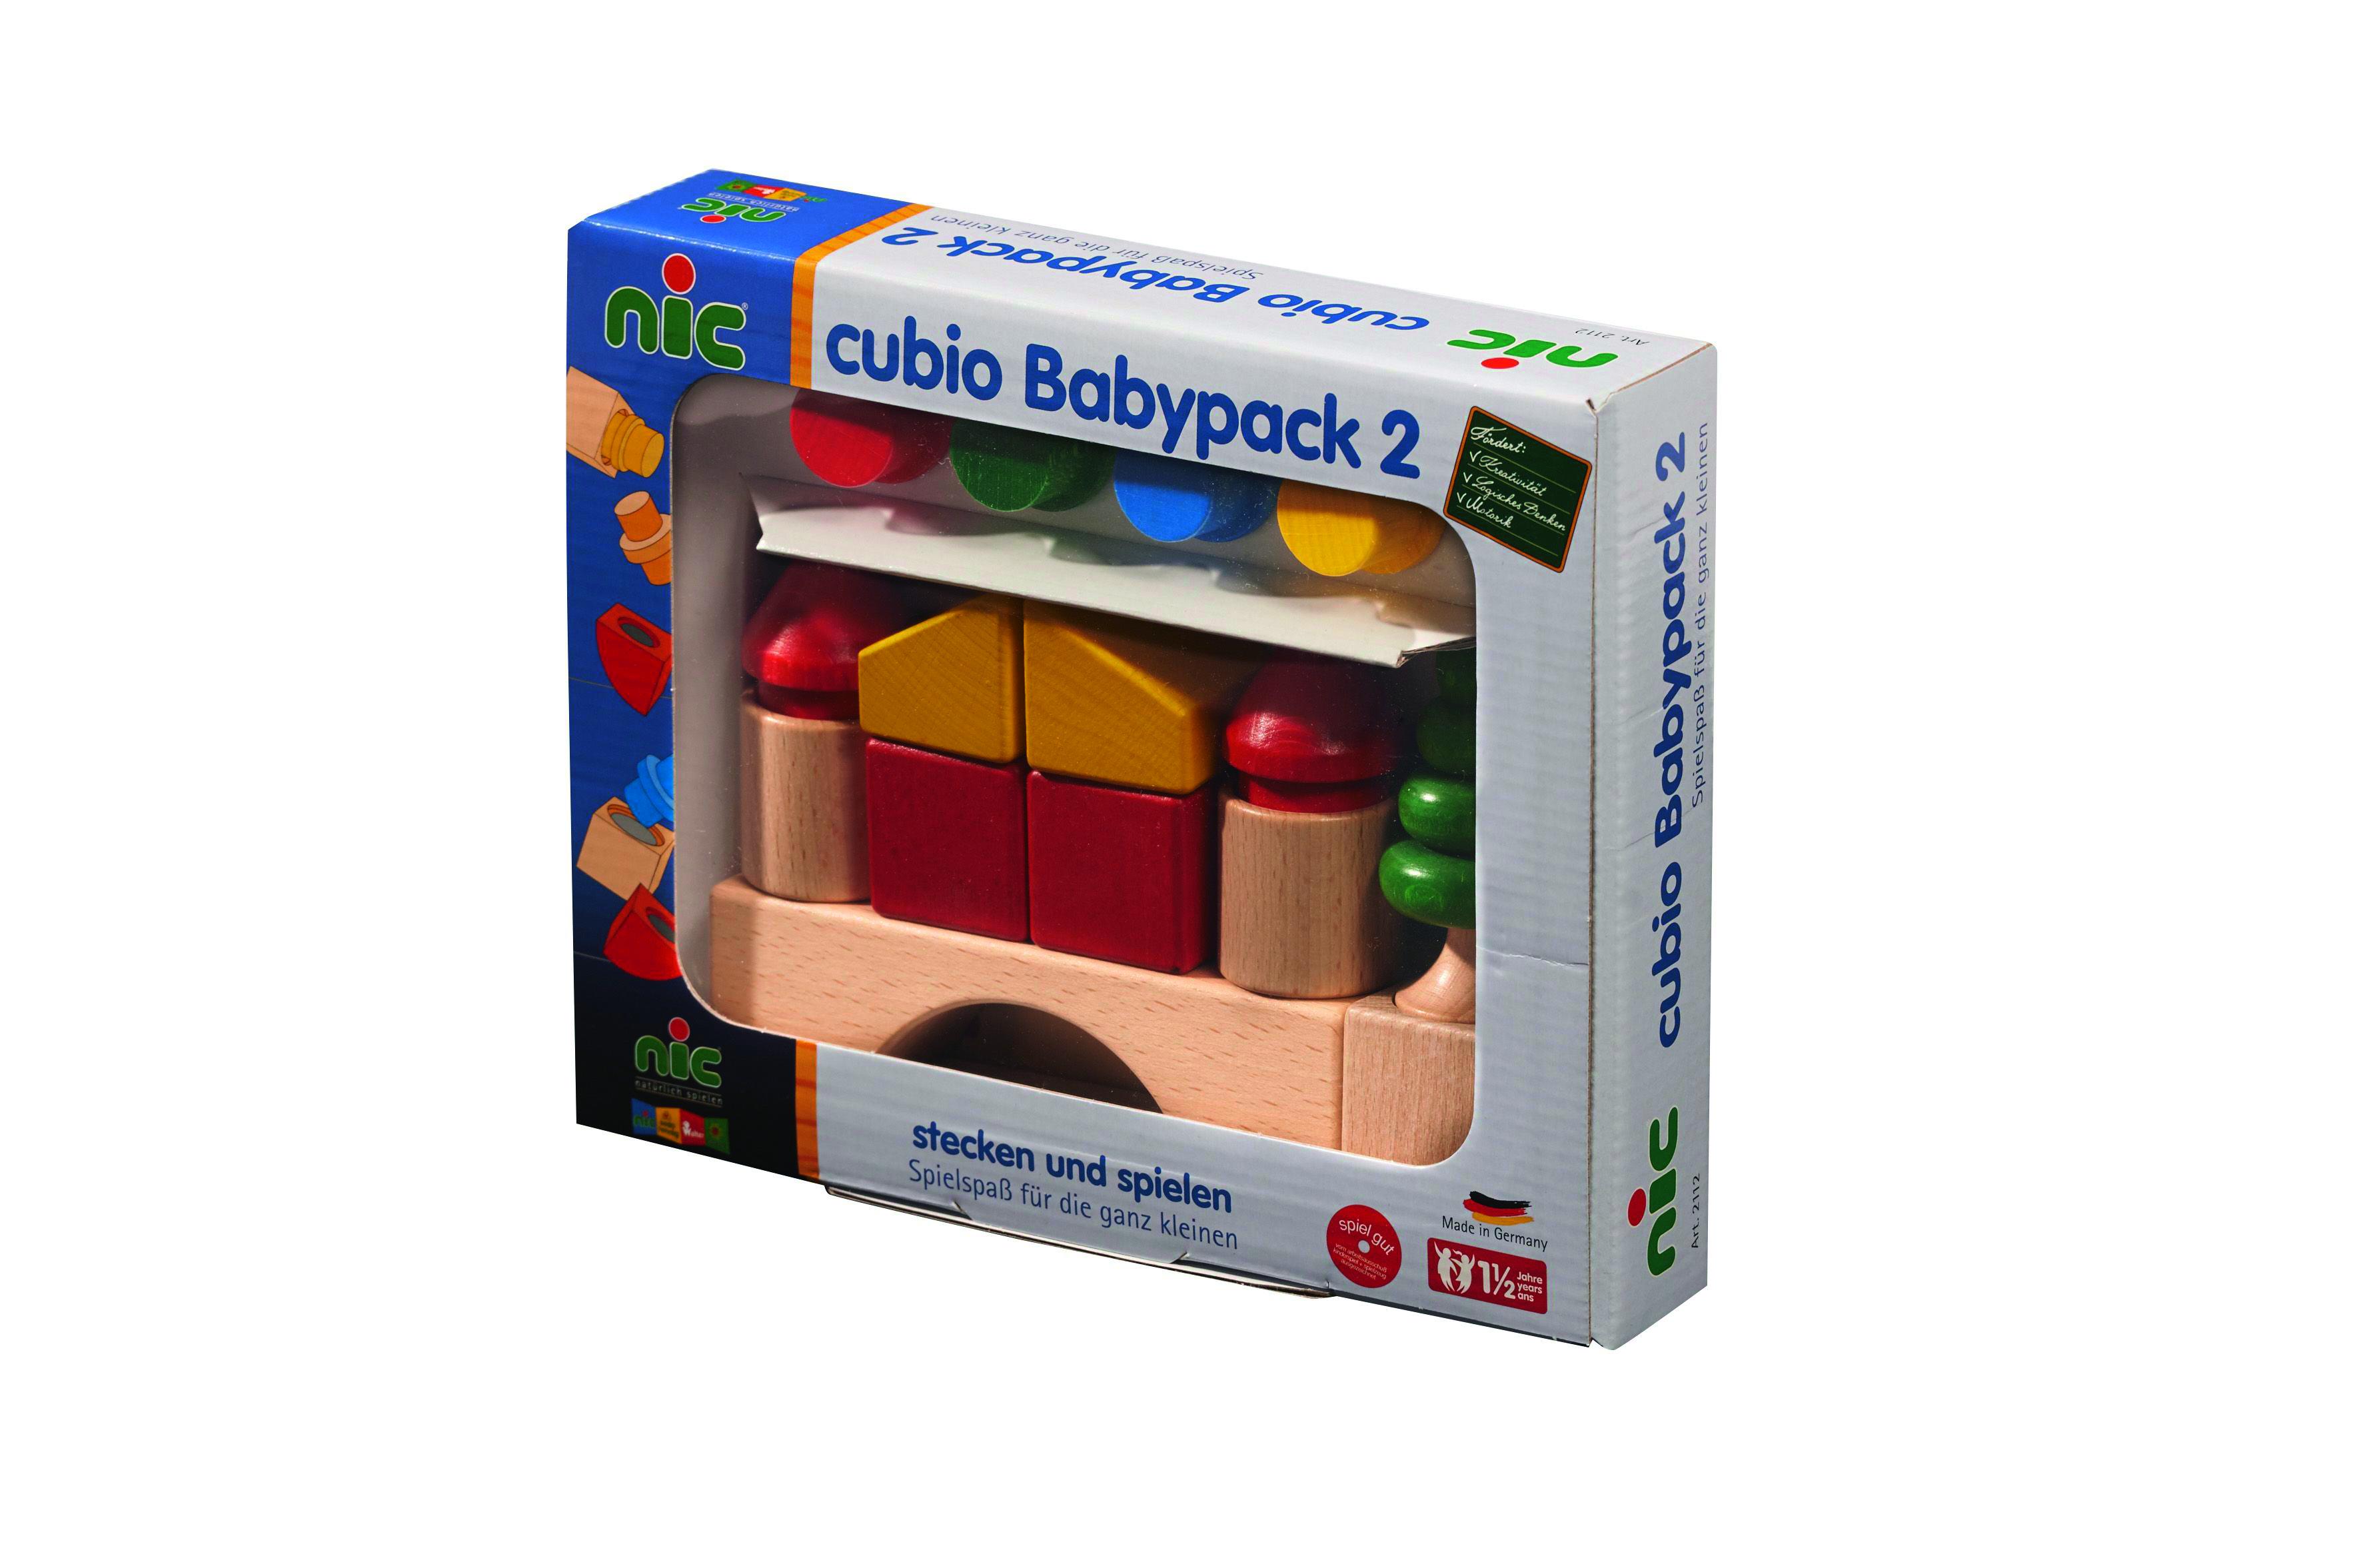 NIC cubio Babypack 2